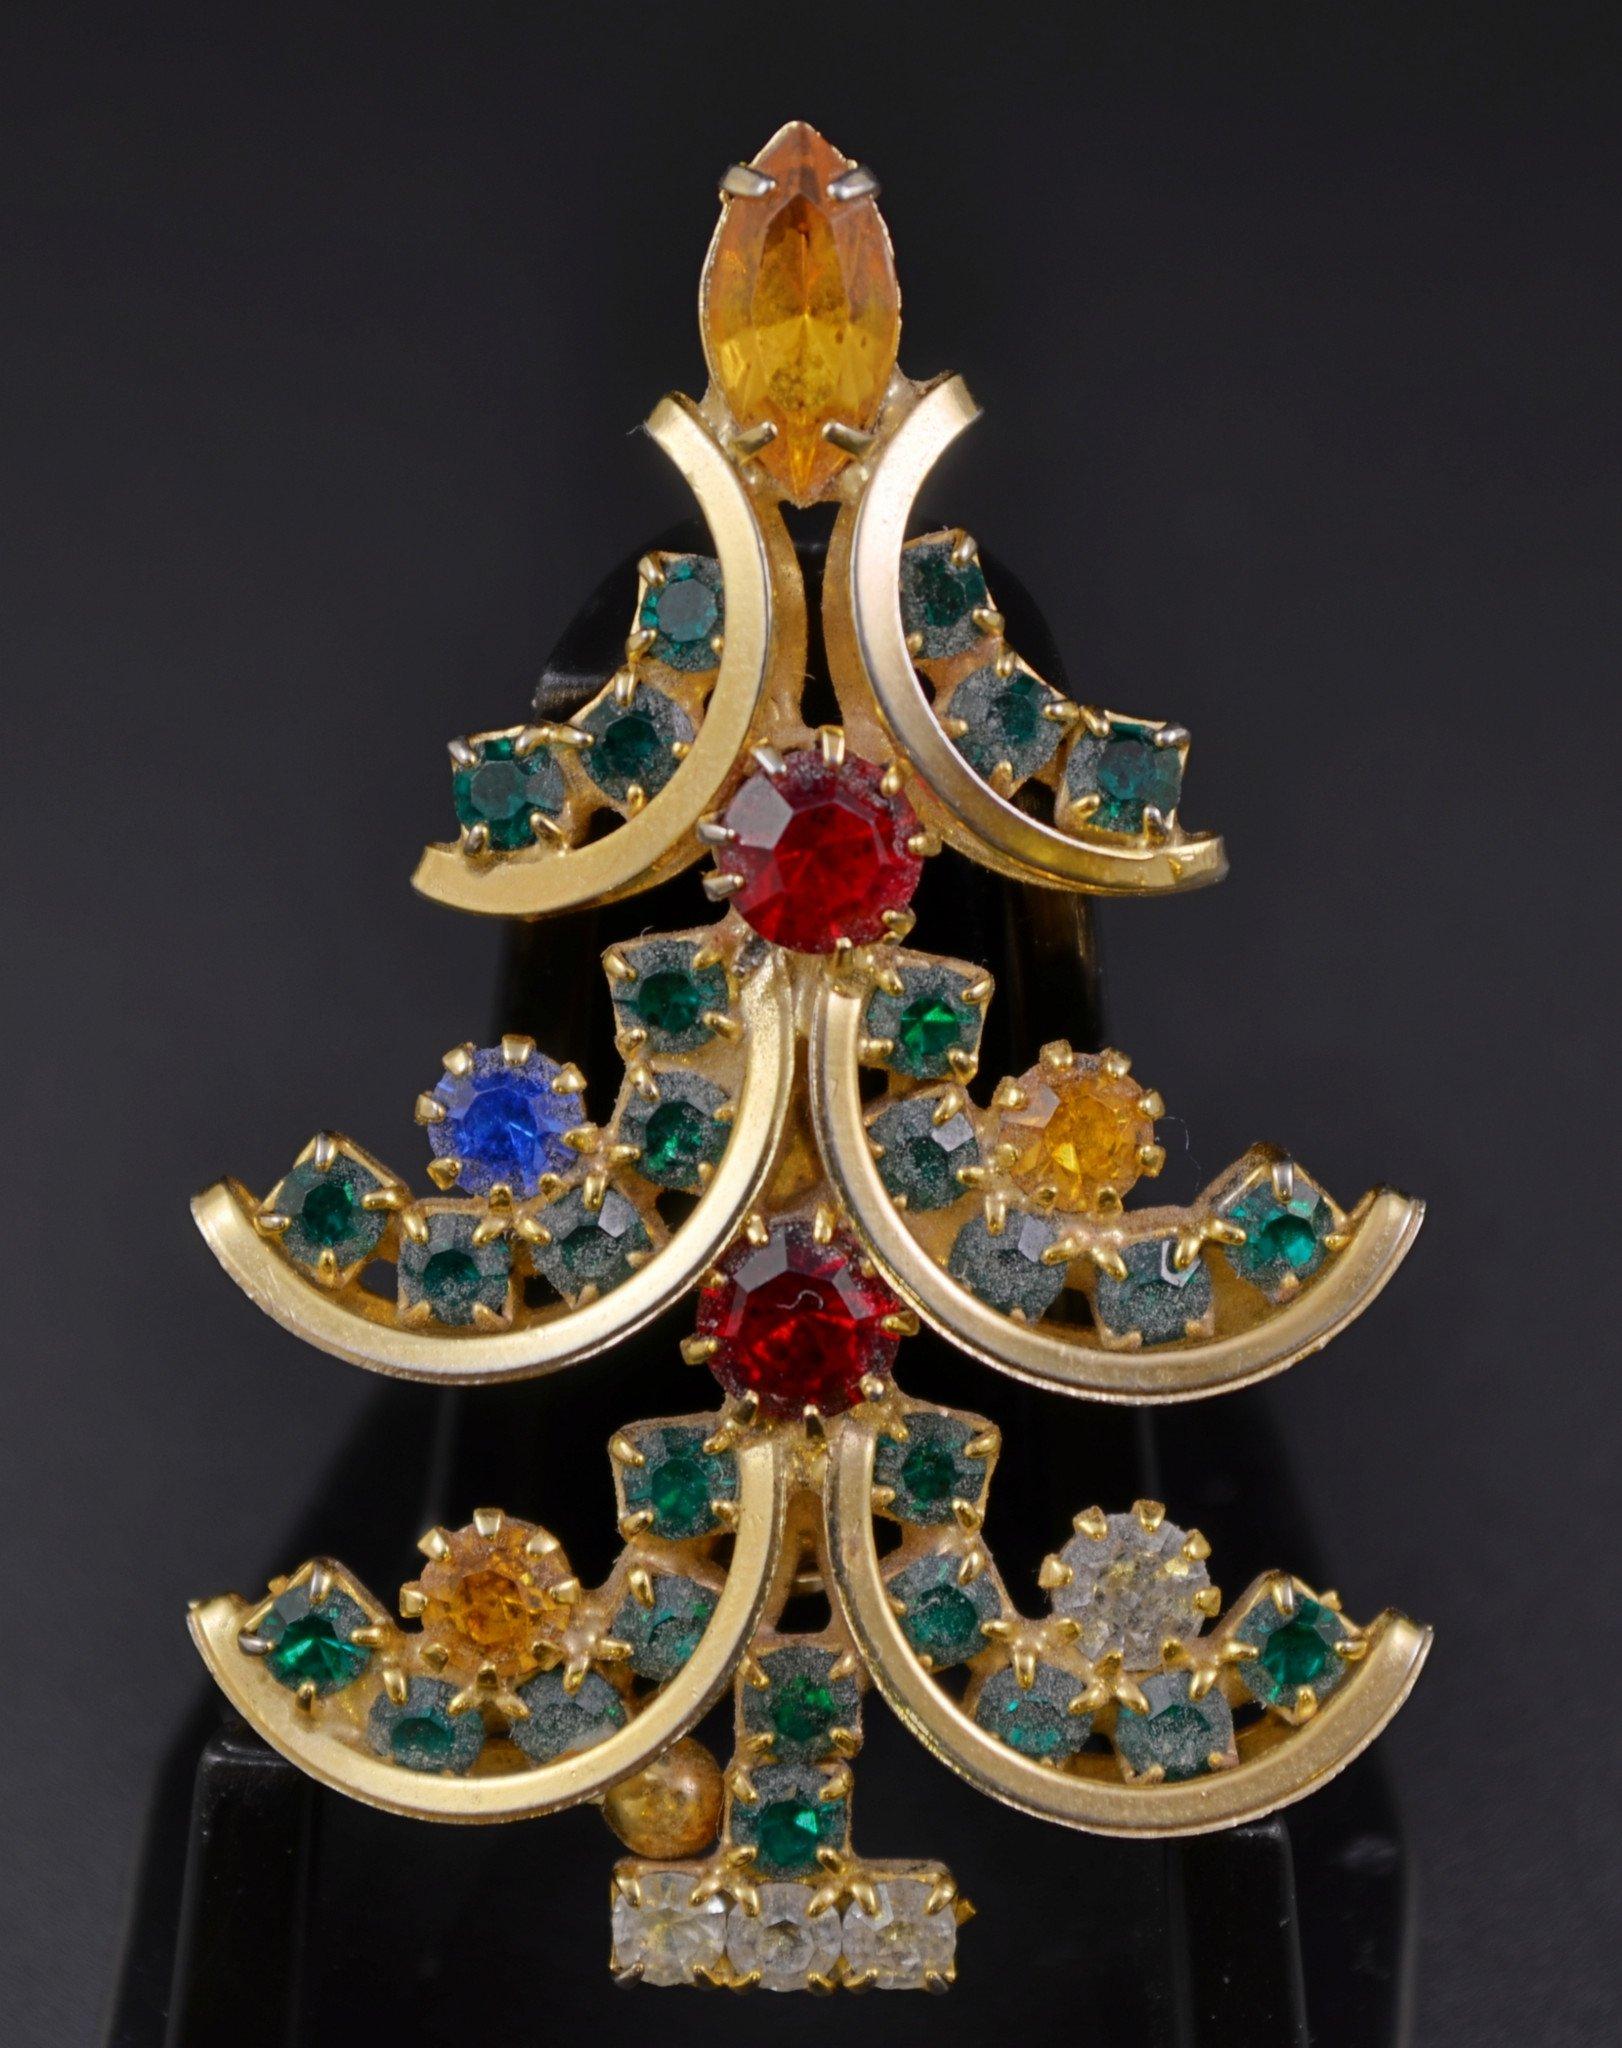 Rhinestone Prongset High End Christmas Tree Pin